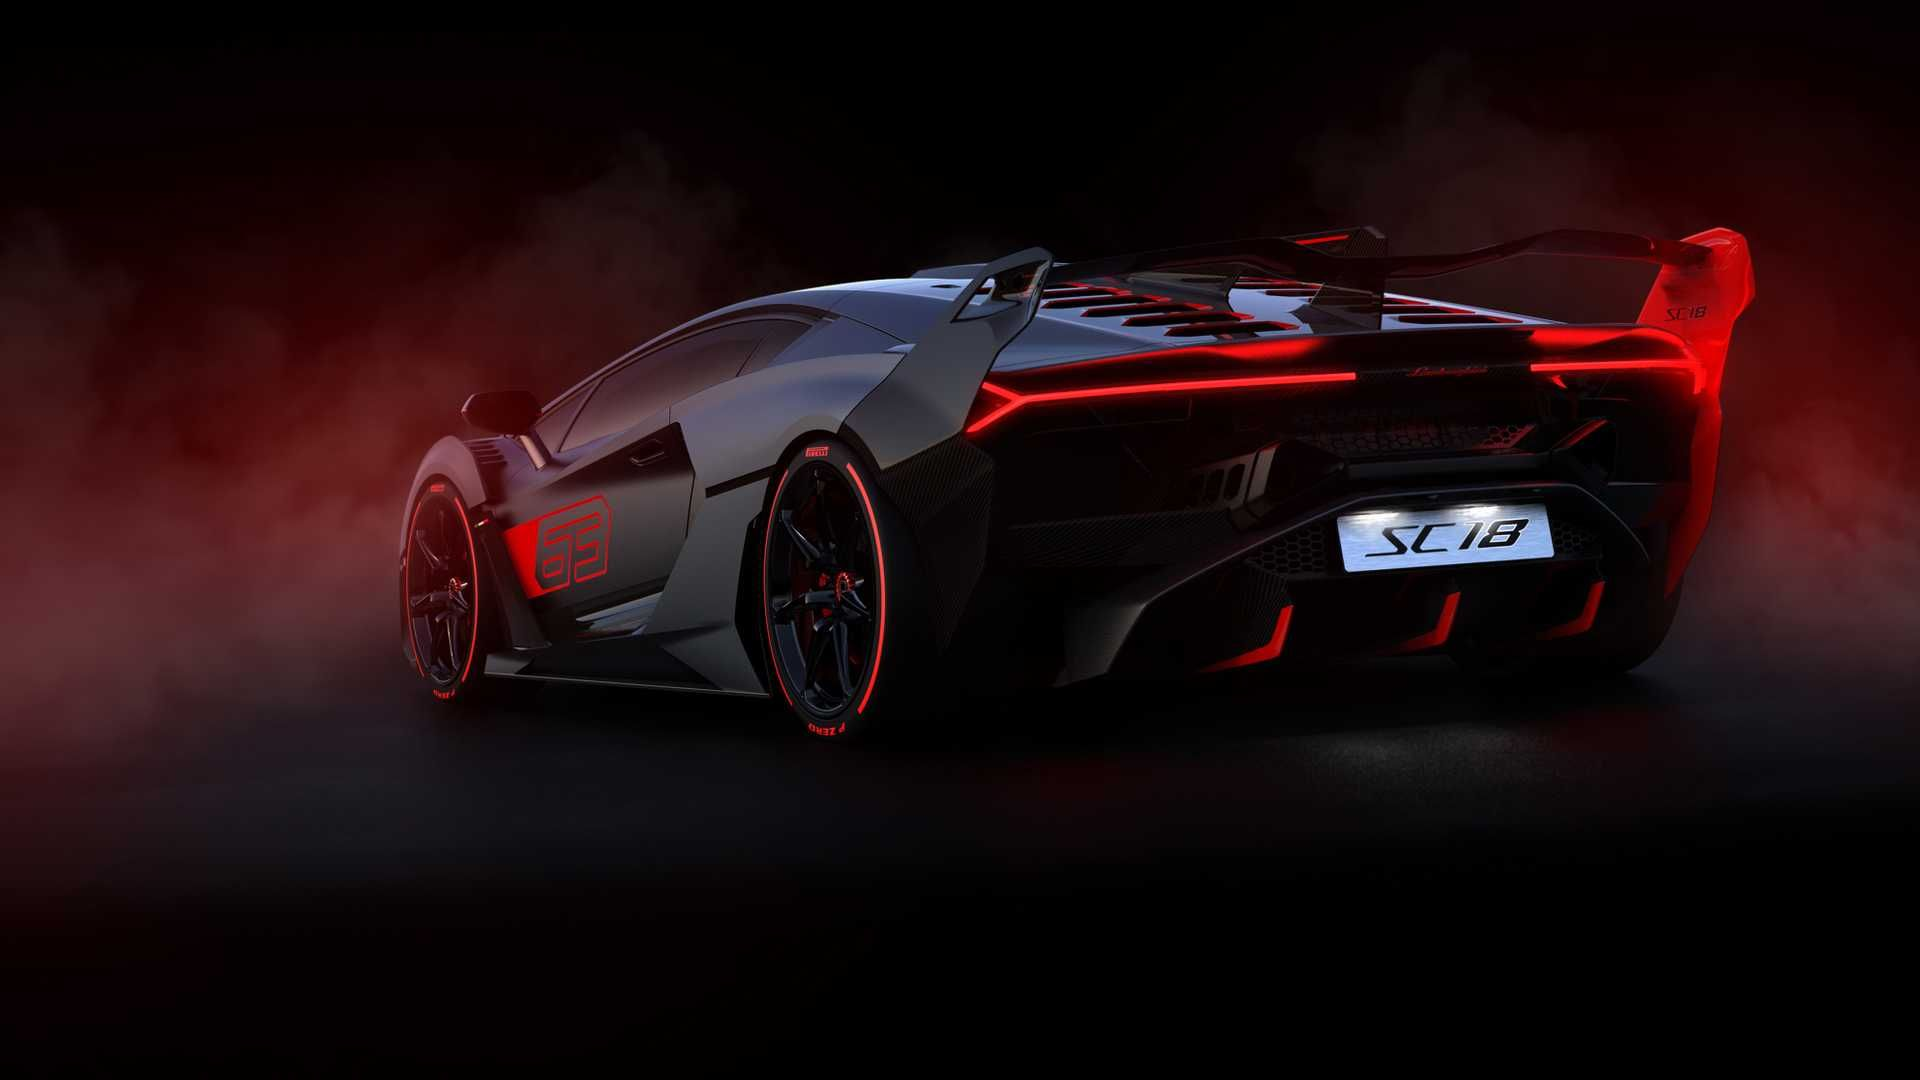 Lamborghini Sc18 Supercar Is A One Off Demonic Aventador Sports Car Lamborghini Classic Cars